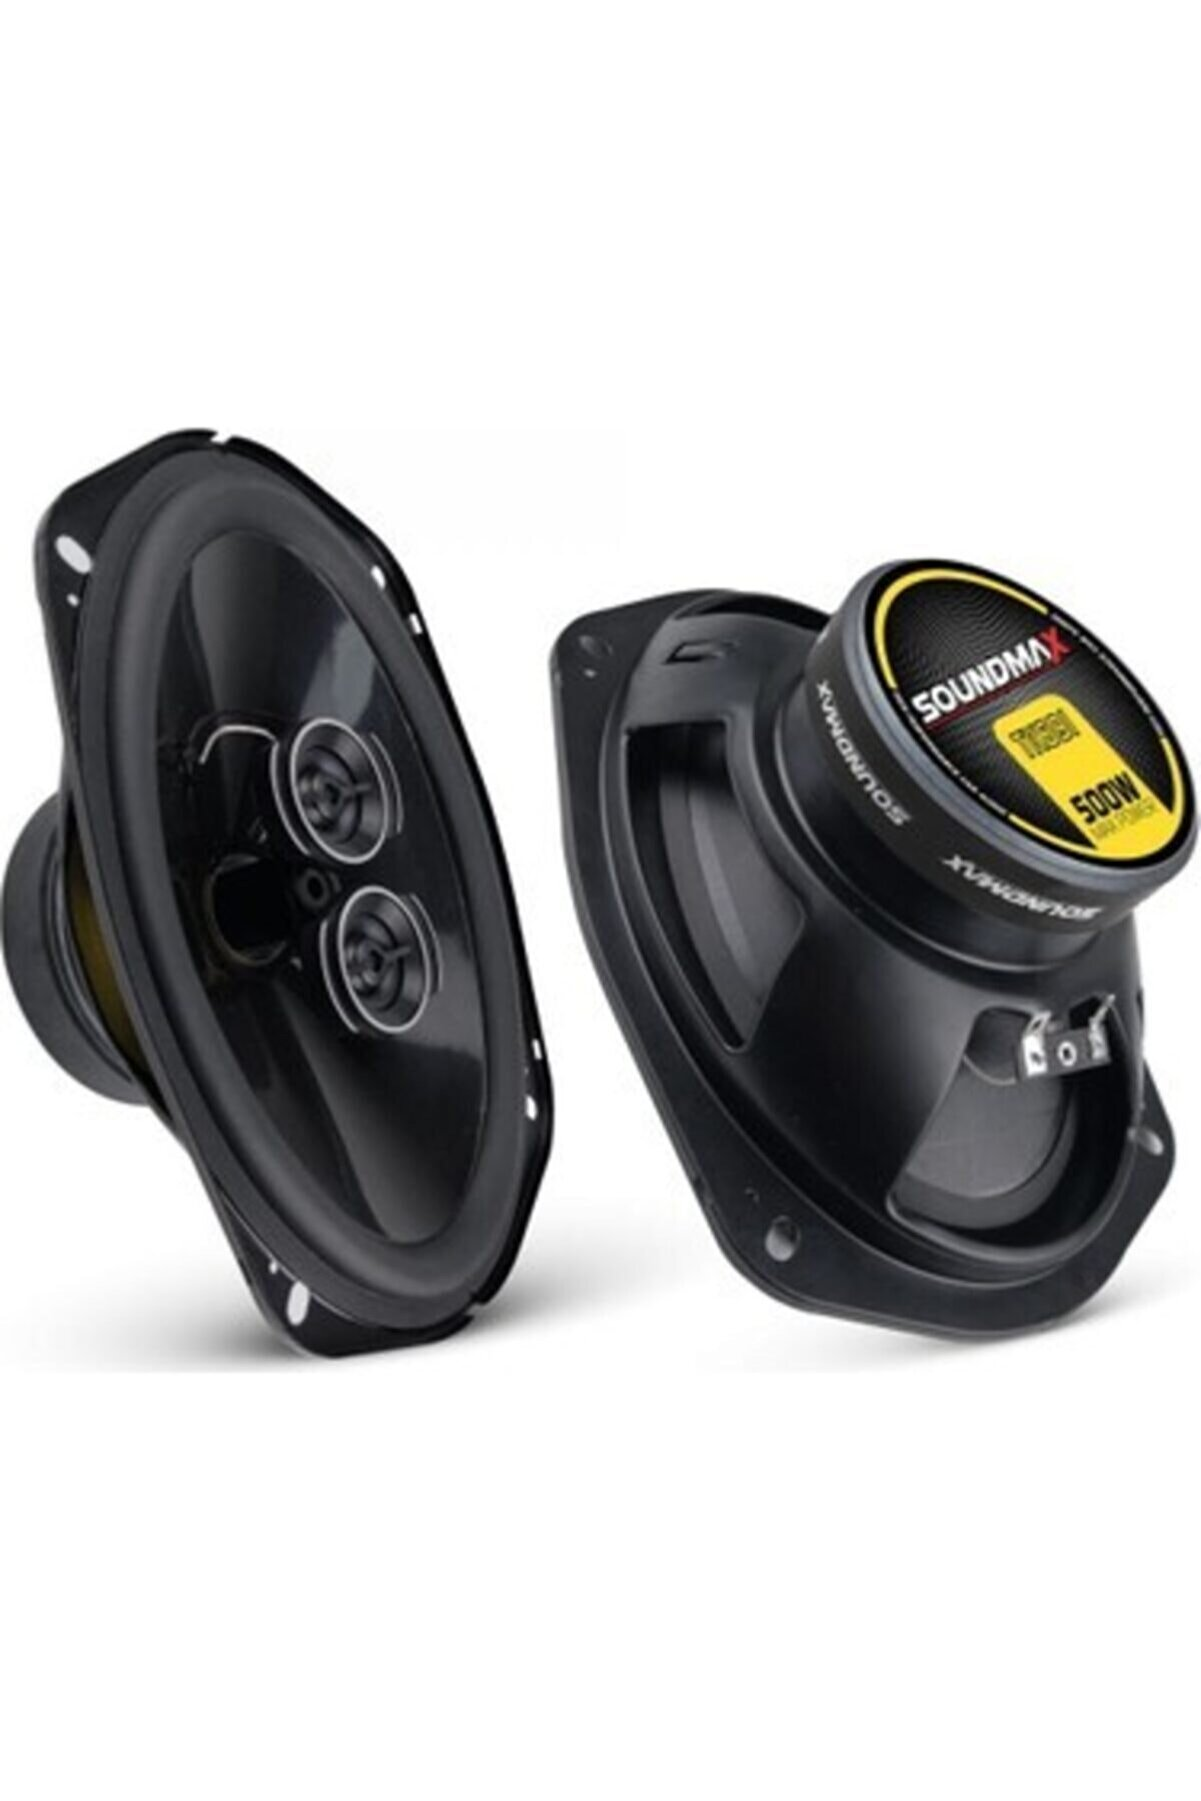 Soundmax Sx-tk691 500 Watt Maximum Oval Hoparlör